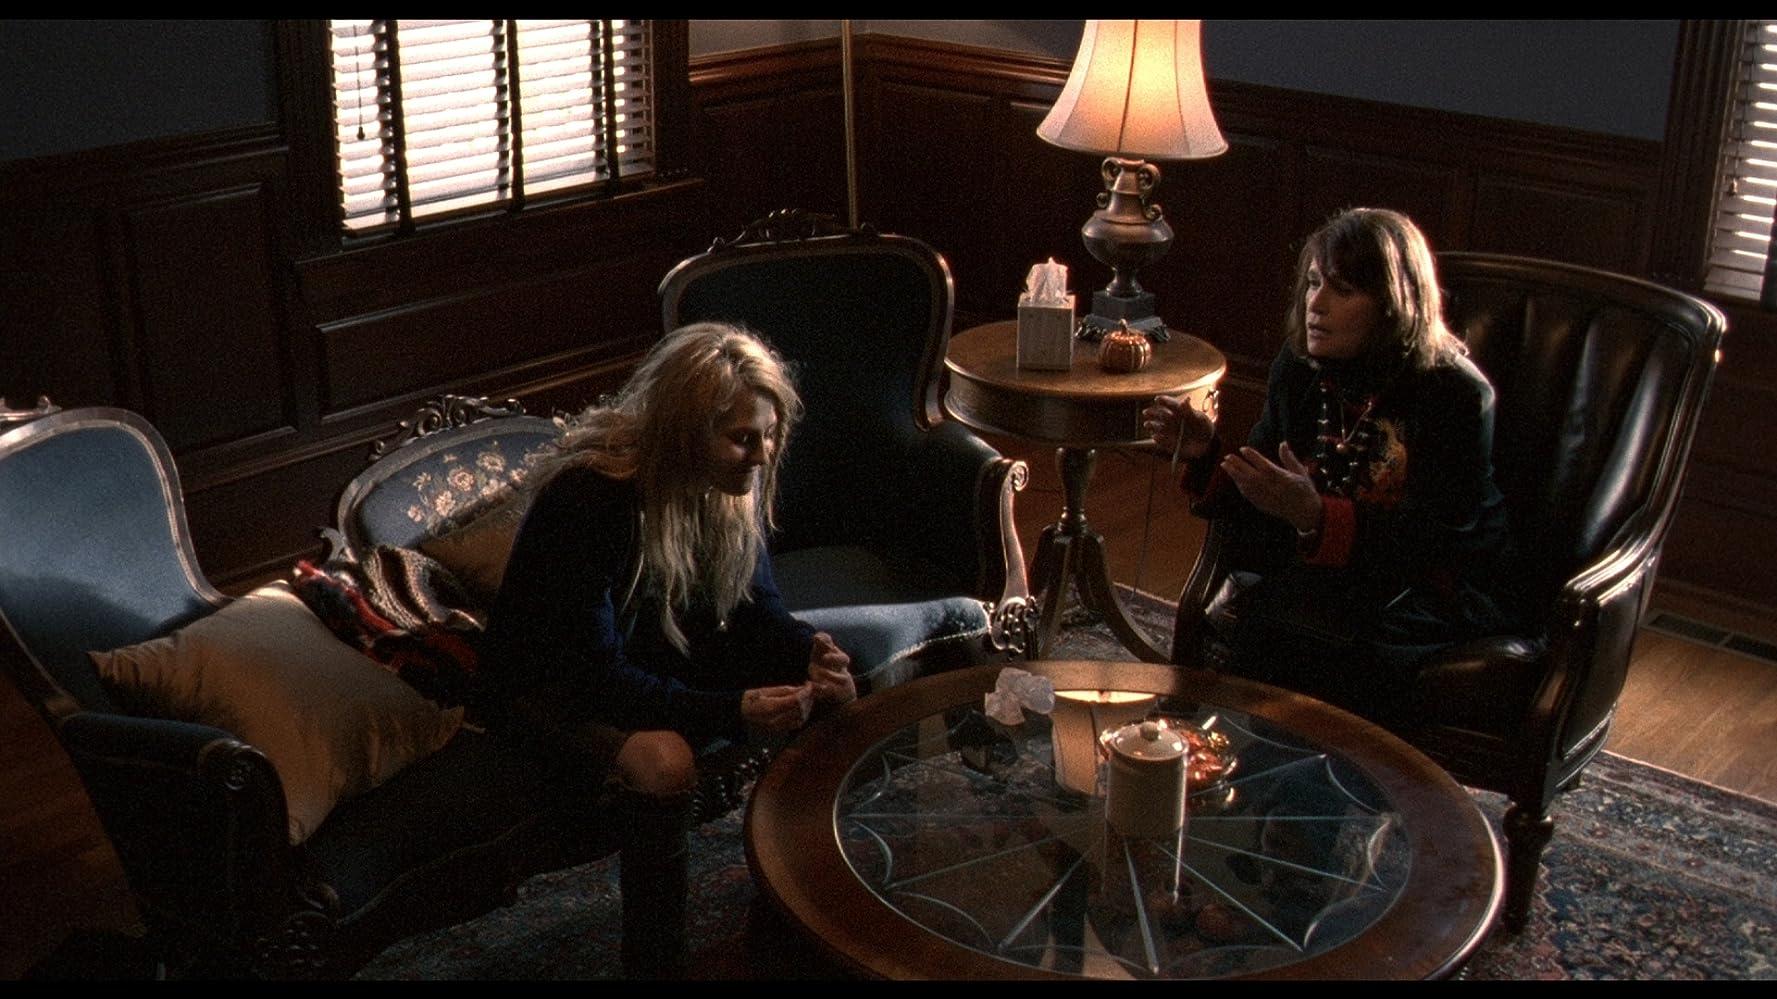 Scout Taylor-Compton and Caroline Williams in Halloween II (2009)